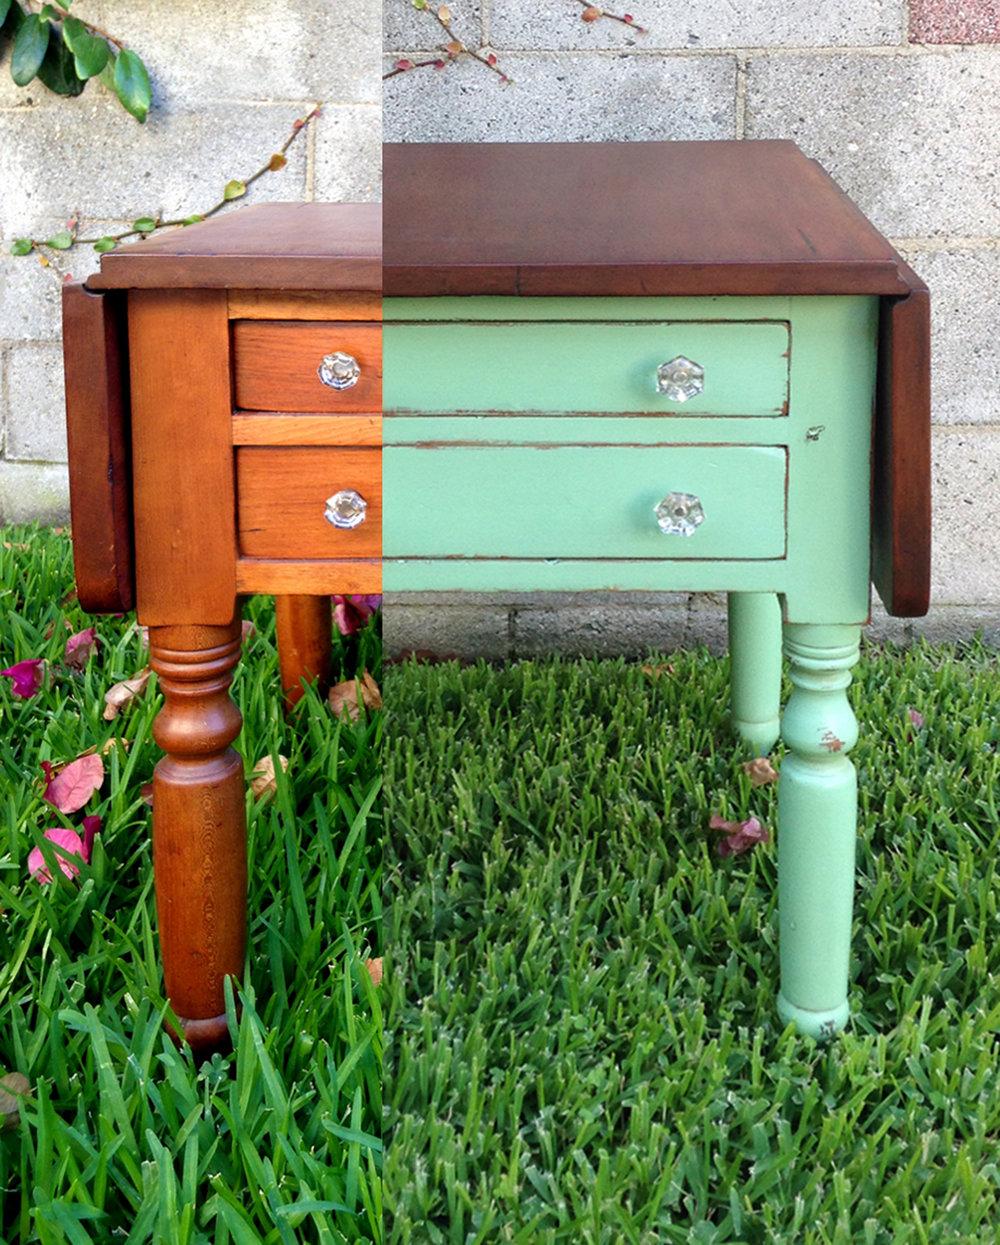 crimson + oak designs | mint chocolate drop leaf table BEFORE & AFTER.jpg